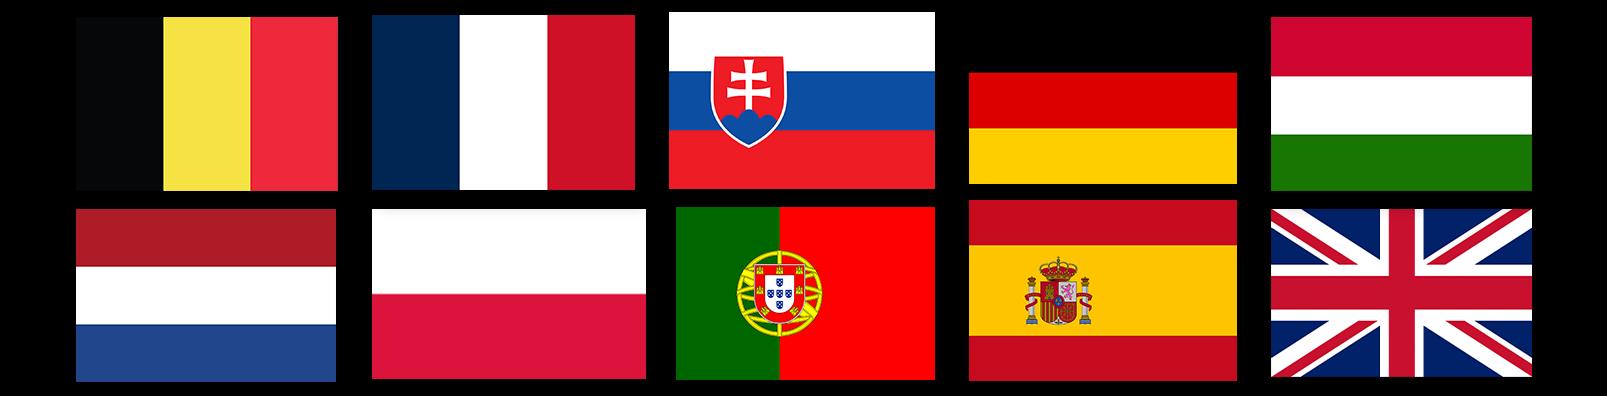 Flags Germany belgium poland slovakia netherlands uk hungary spain